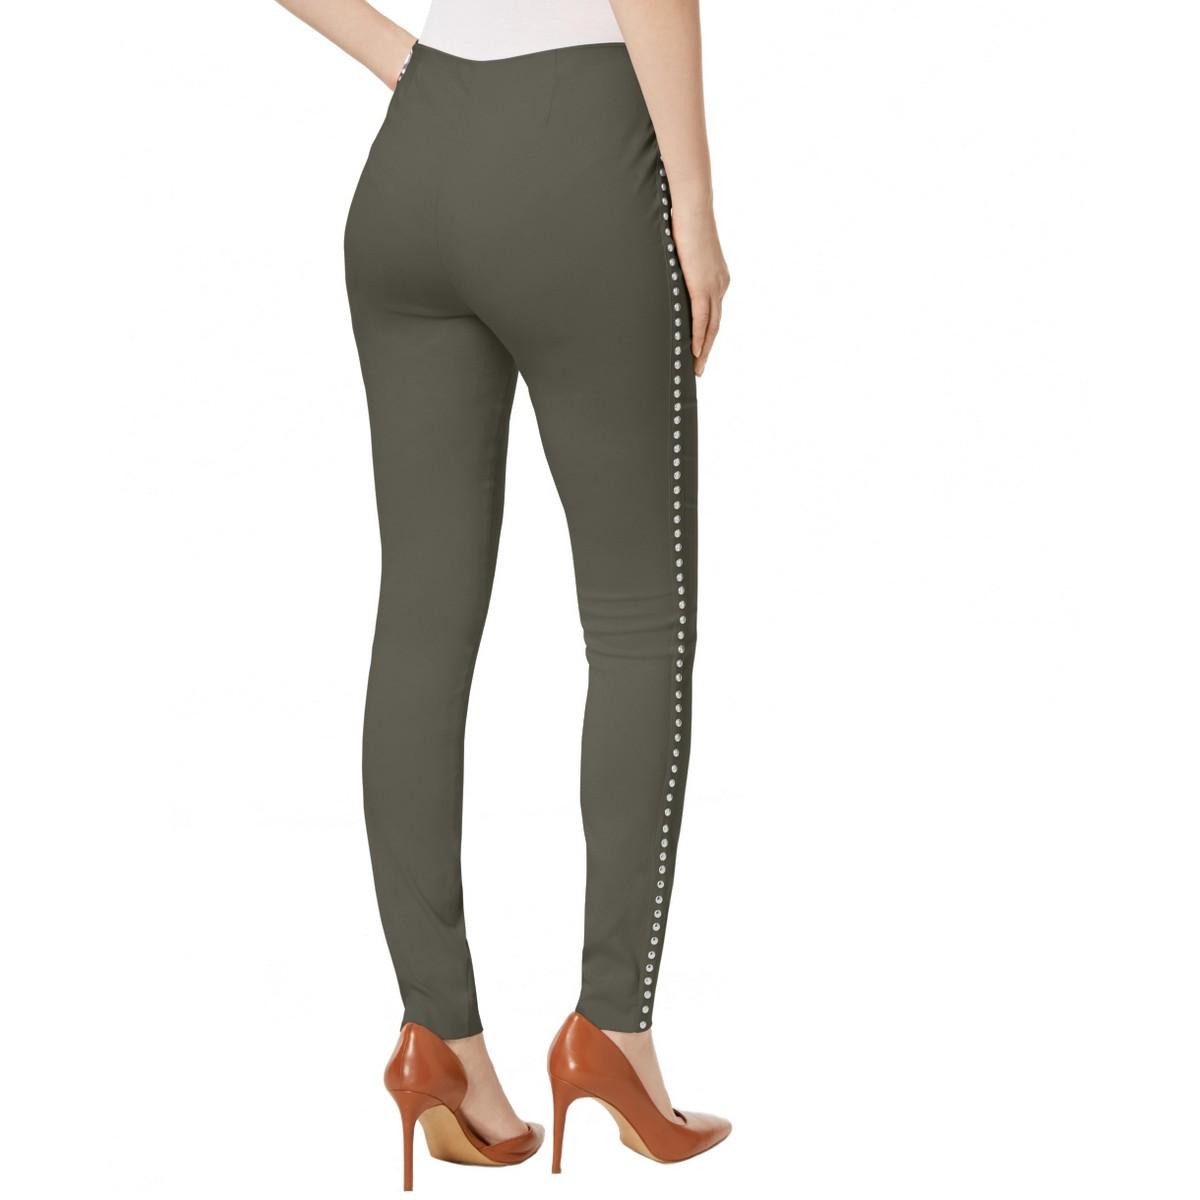 INC NEW Women/'s Beaded Curvy Mid Rise Pull On Skinny Pants TEDO